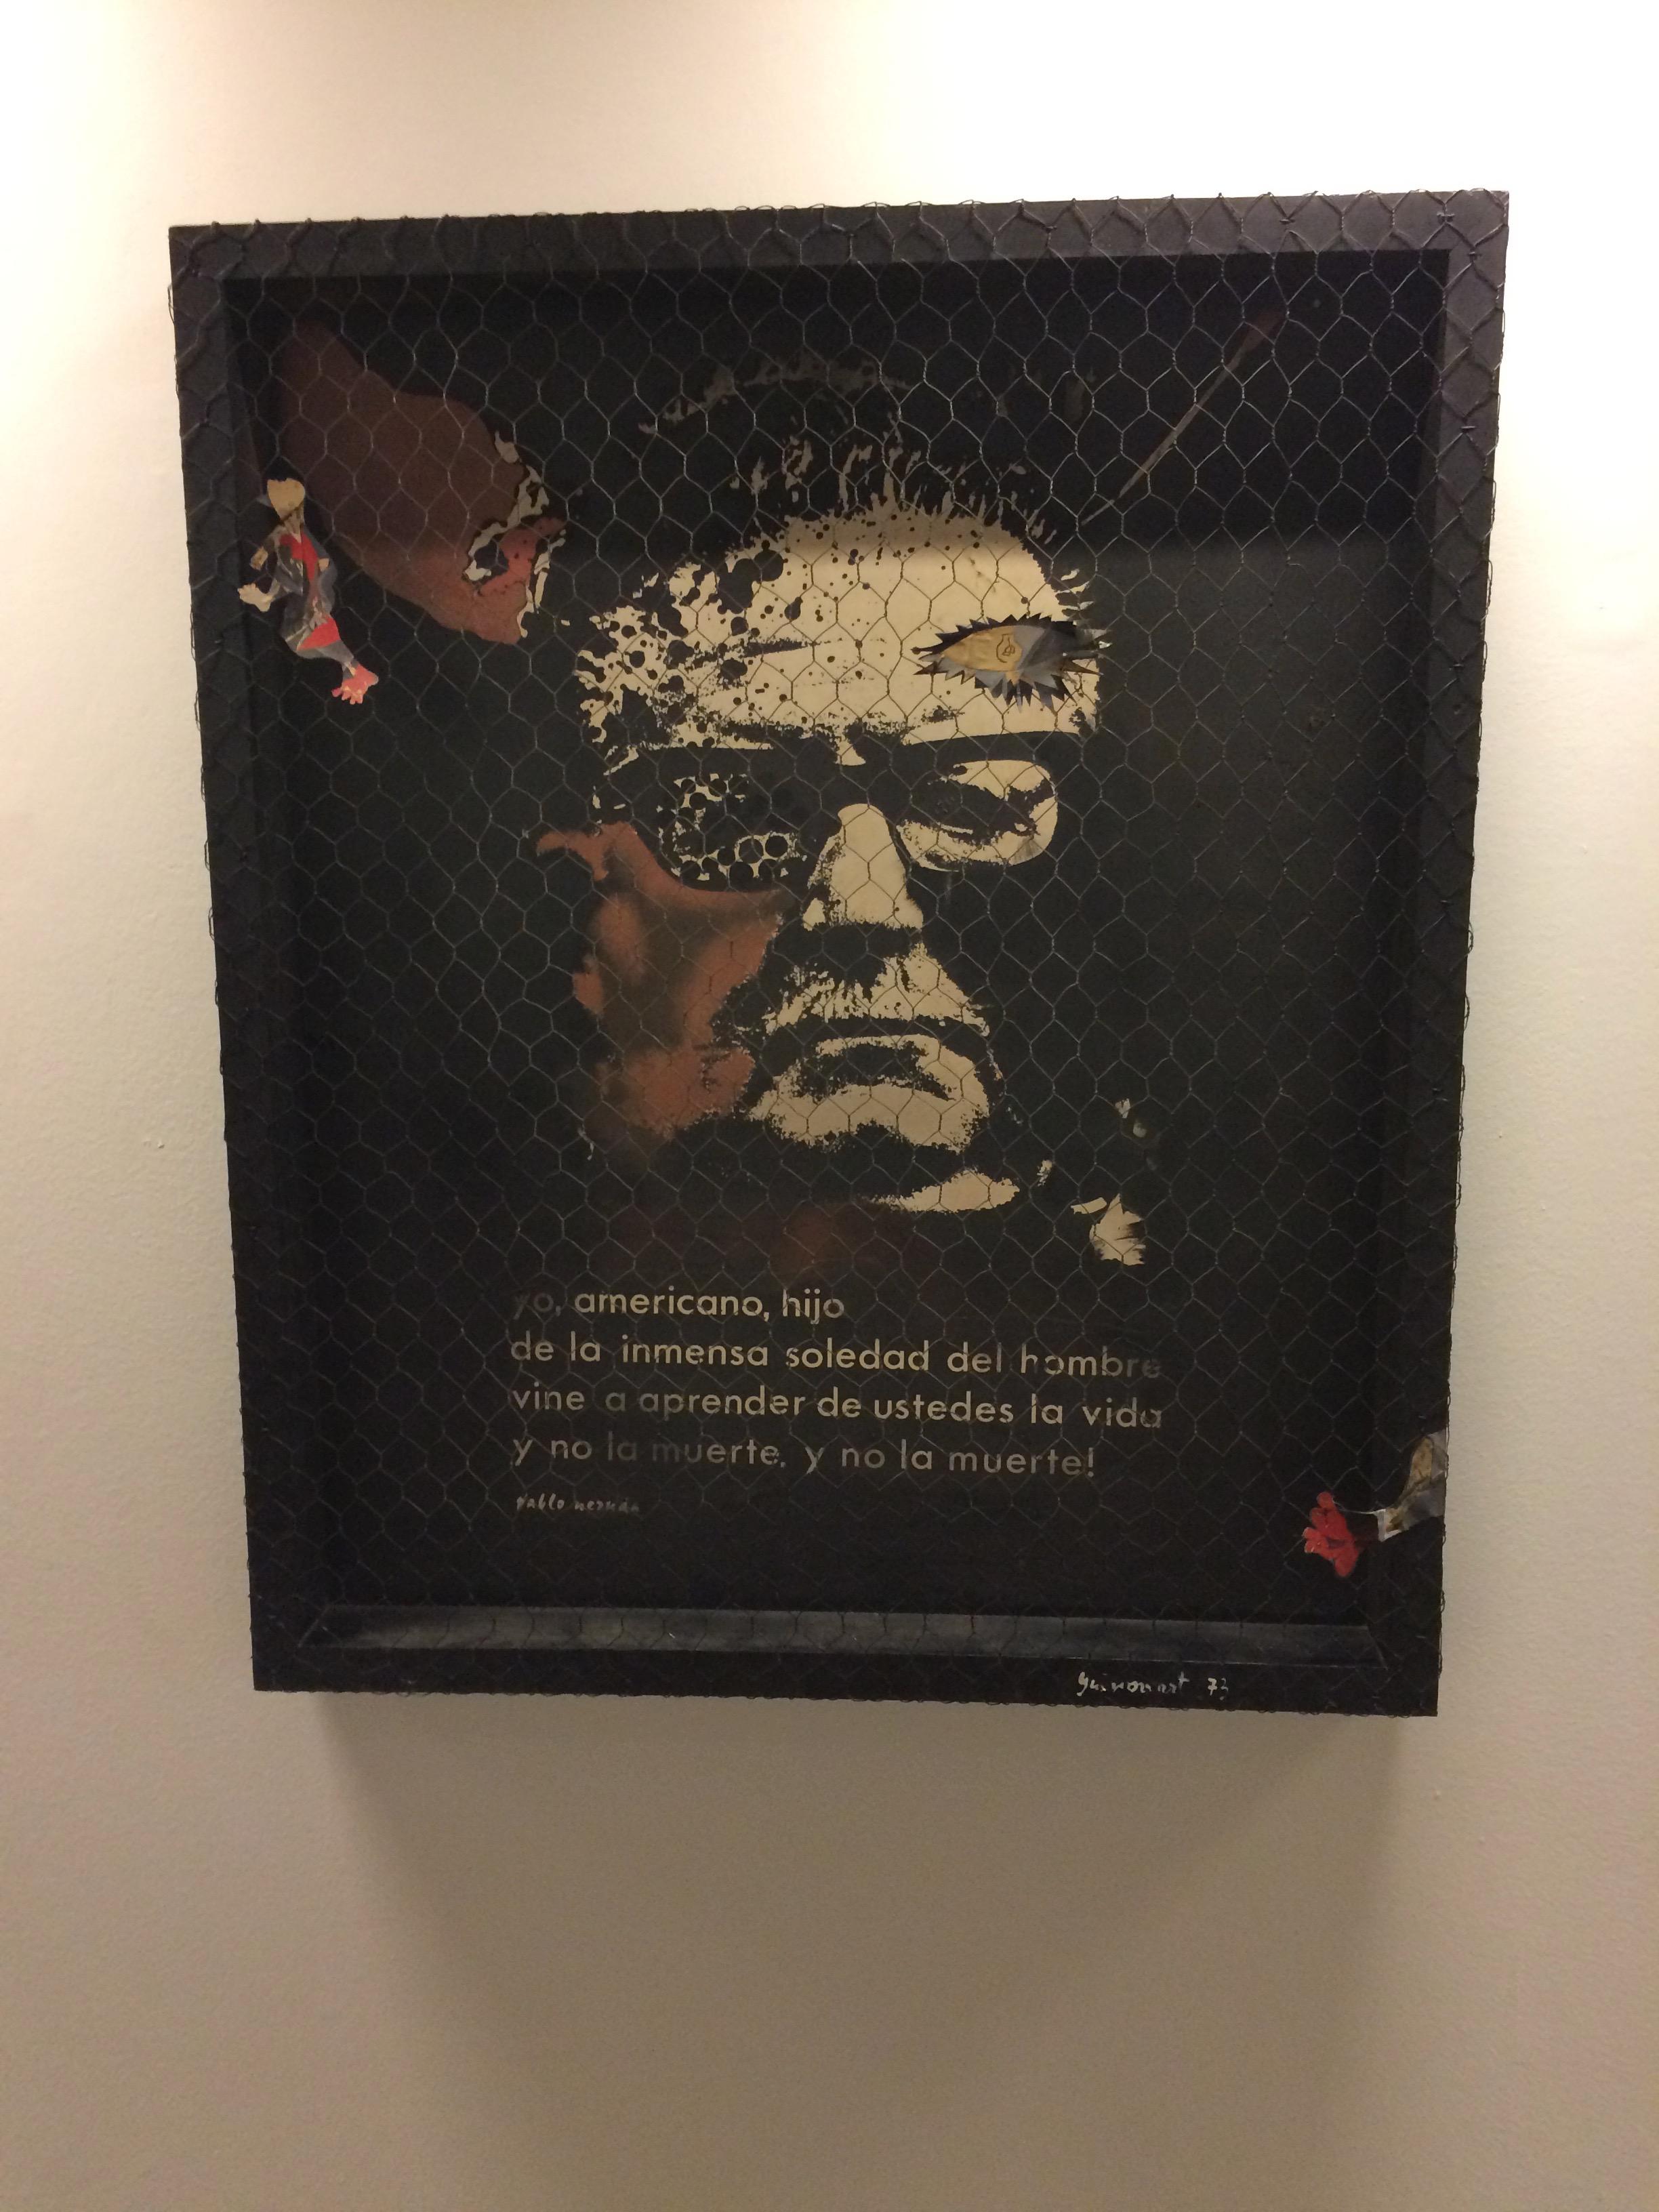 Josep Guinovart. Homenatge a Allende, 1973